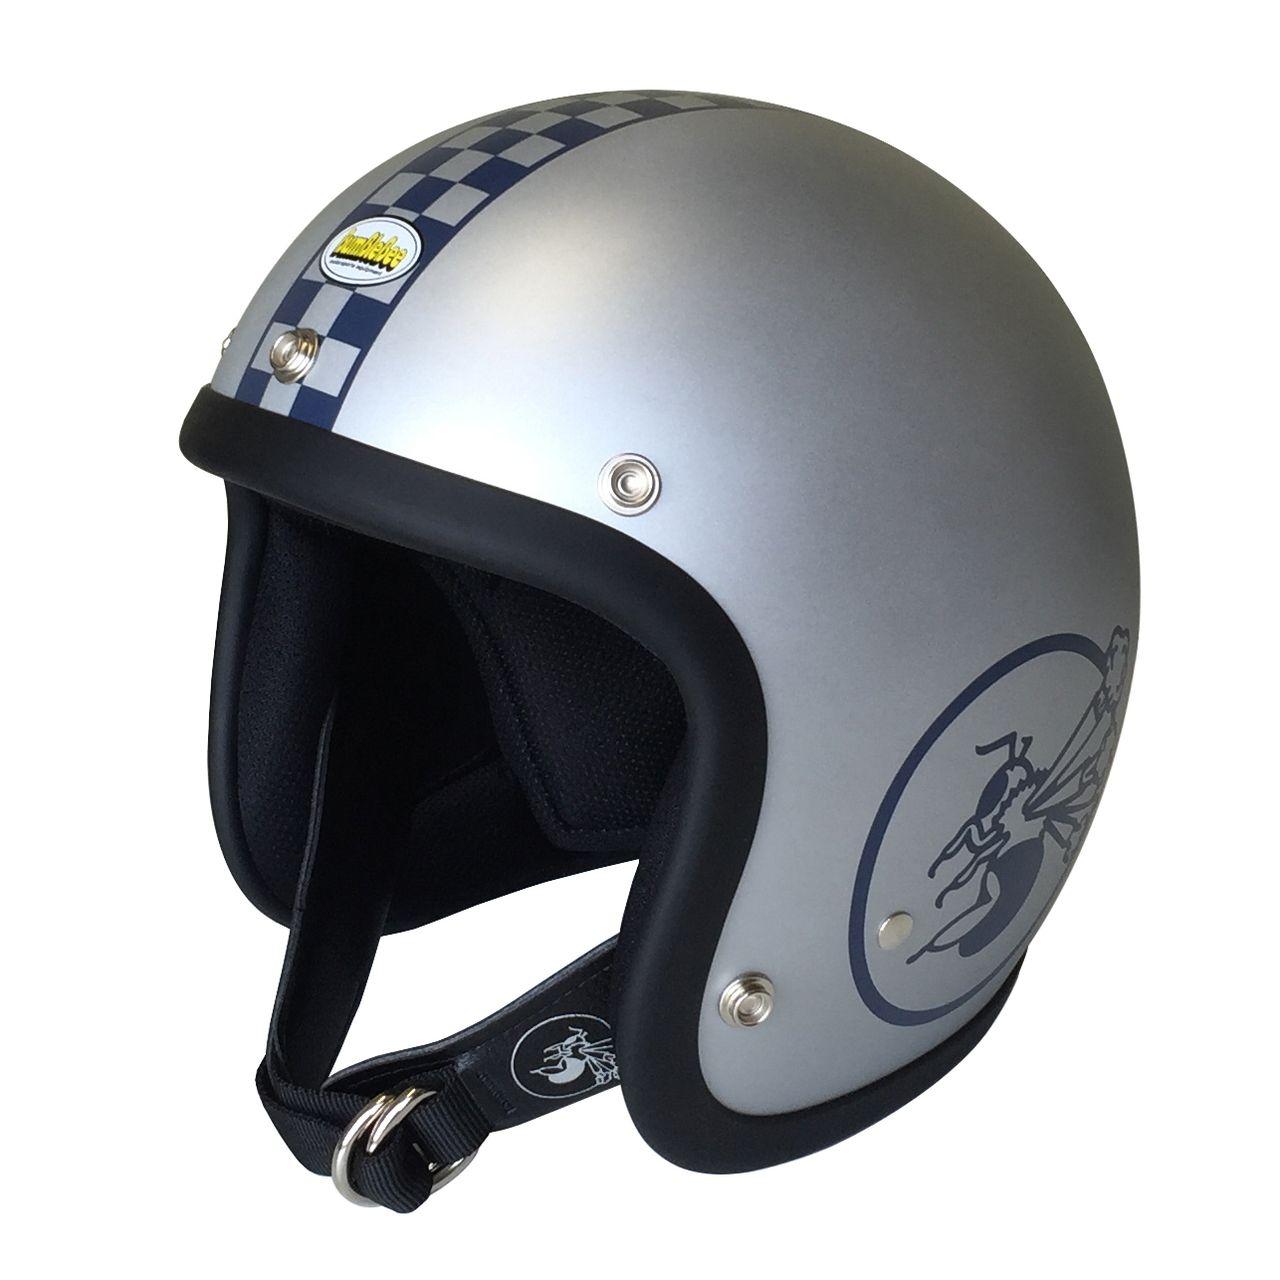 【REIT】大黃蜂 BBHM-03N安全帽 - 「Webike-摩托百貨」